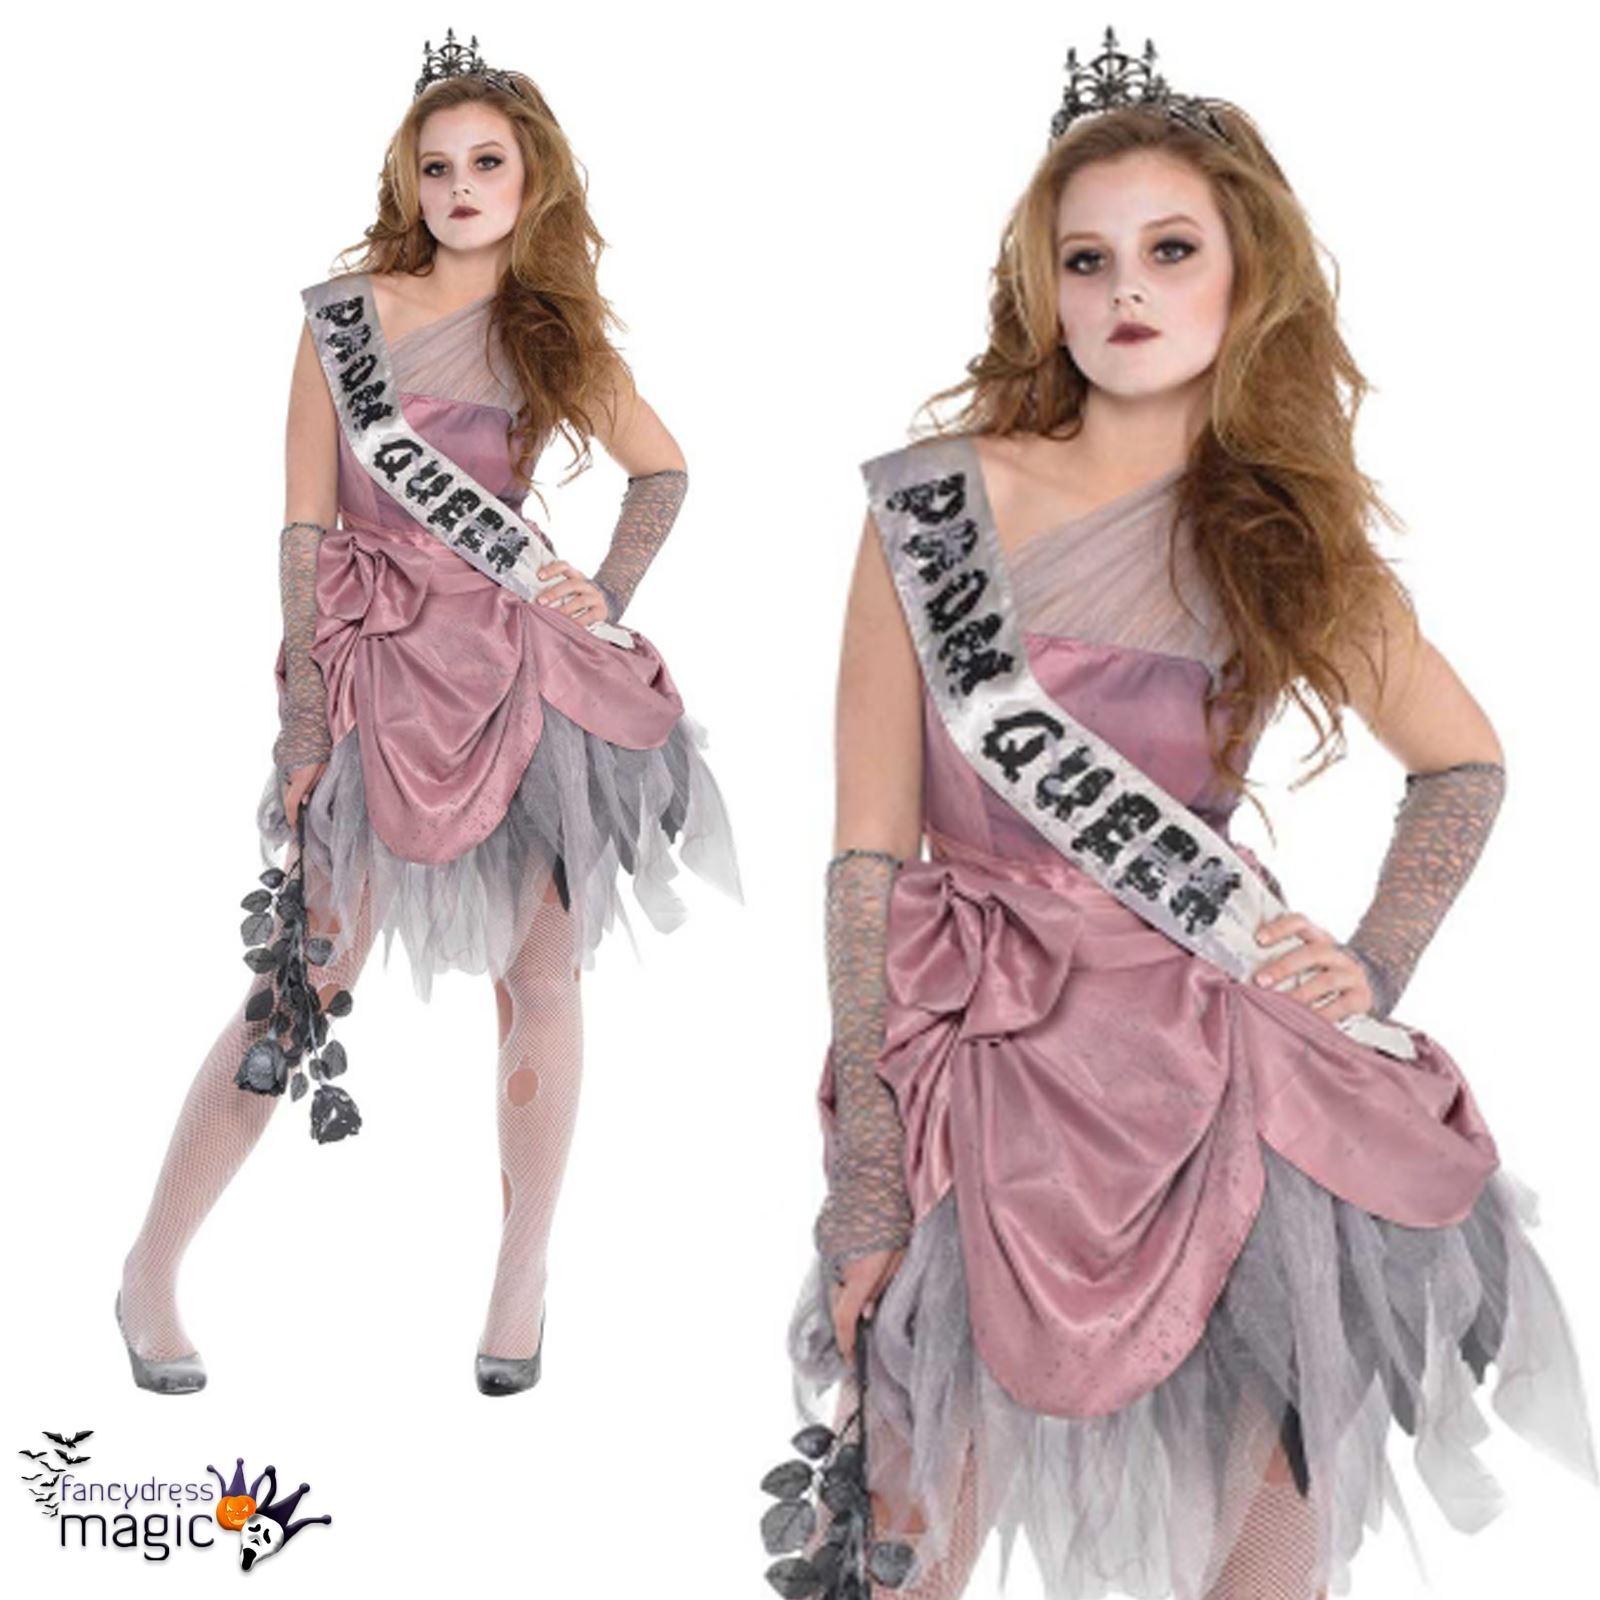 nia adolescente zom Zombie Graduacin Reina Halloween Terror